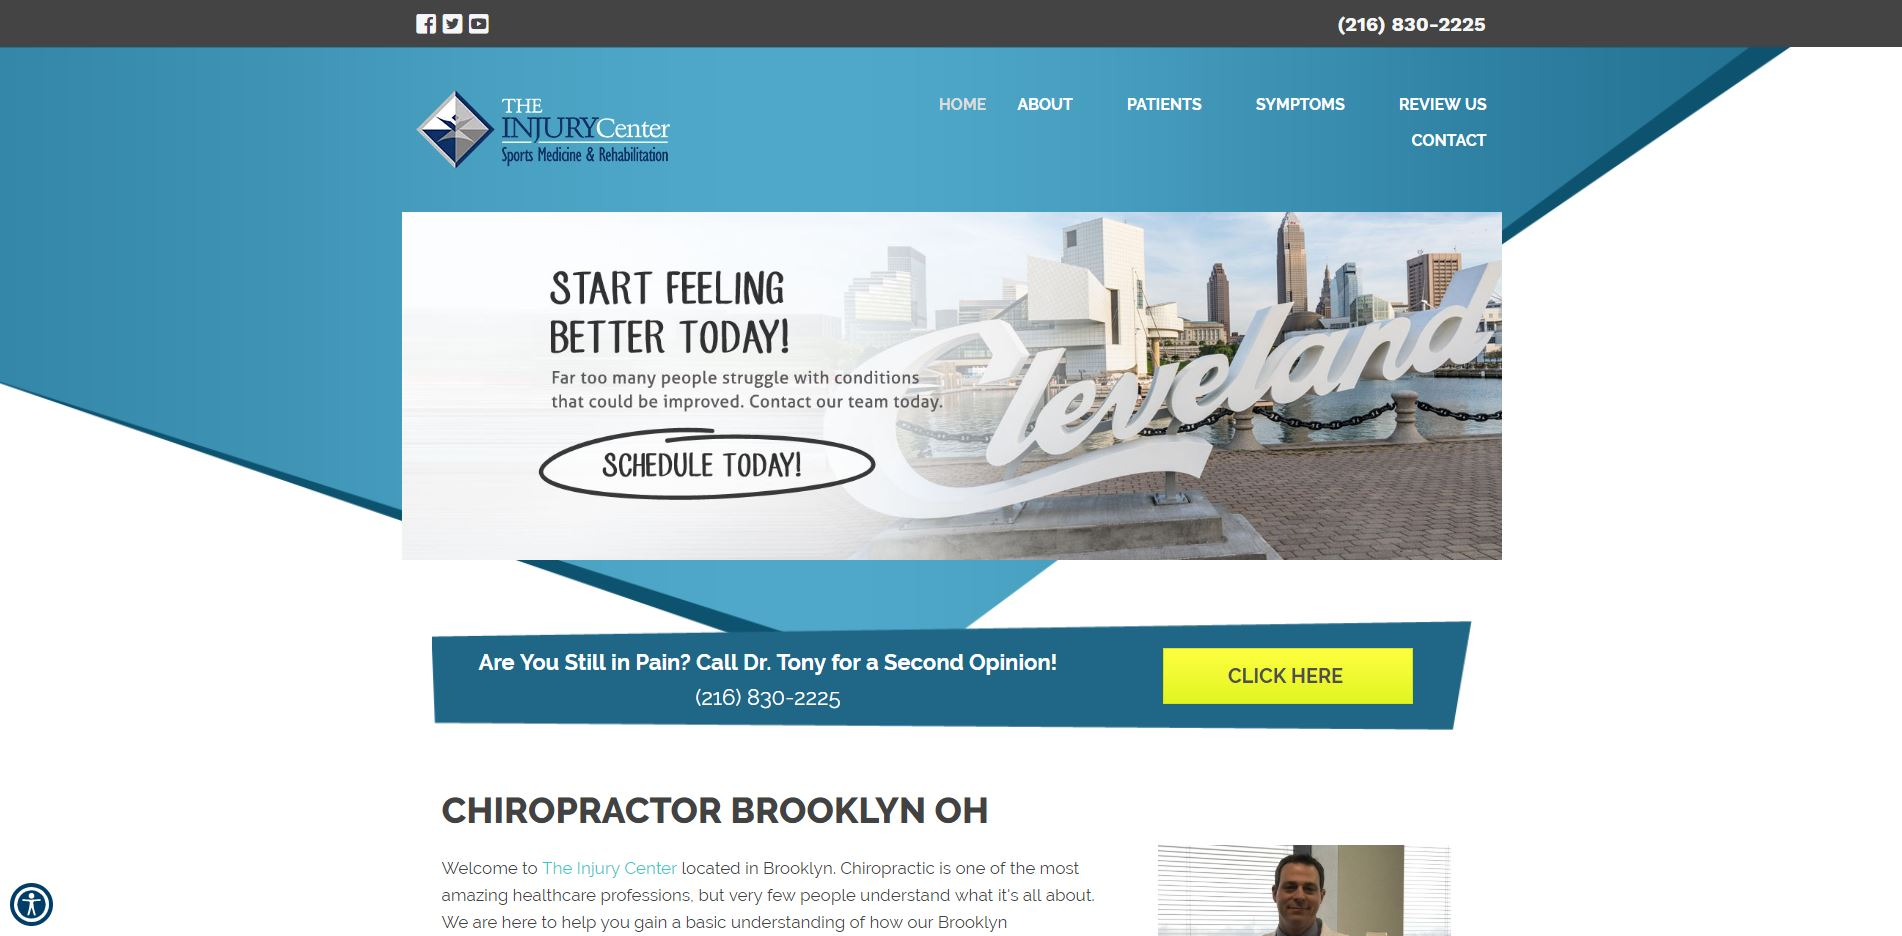 Chiropractor in Cleveland